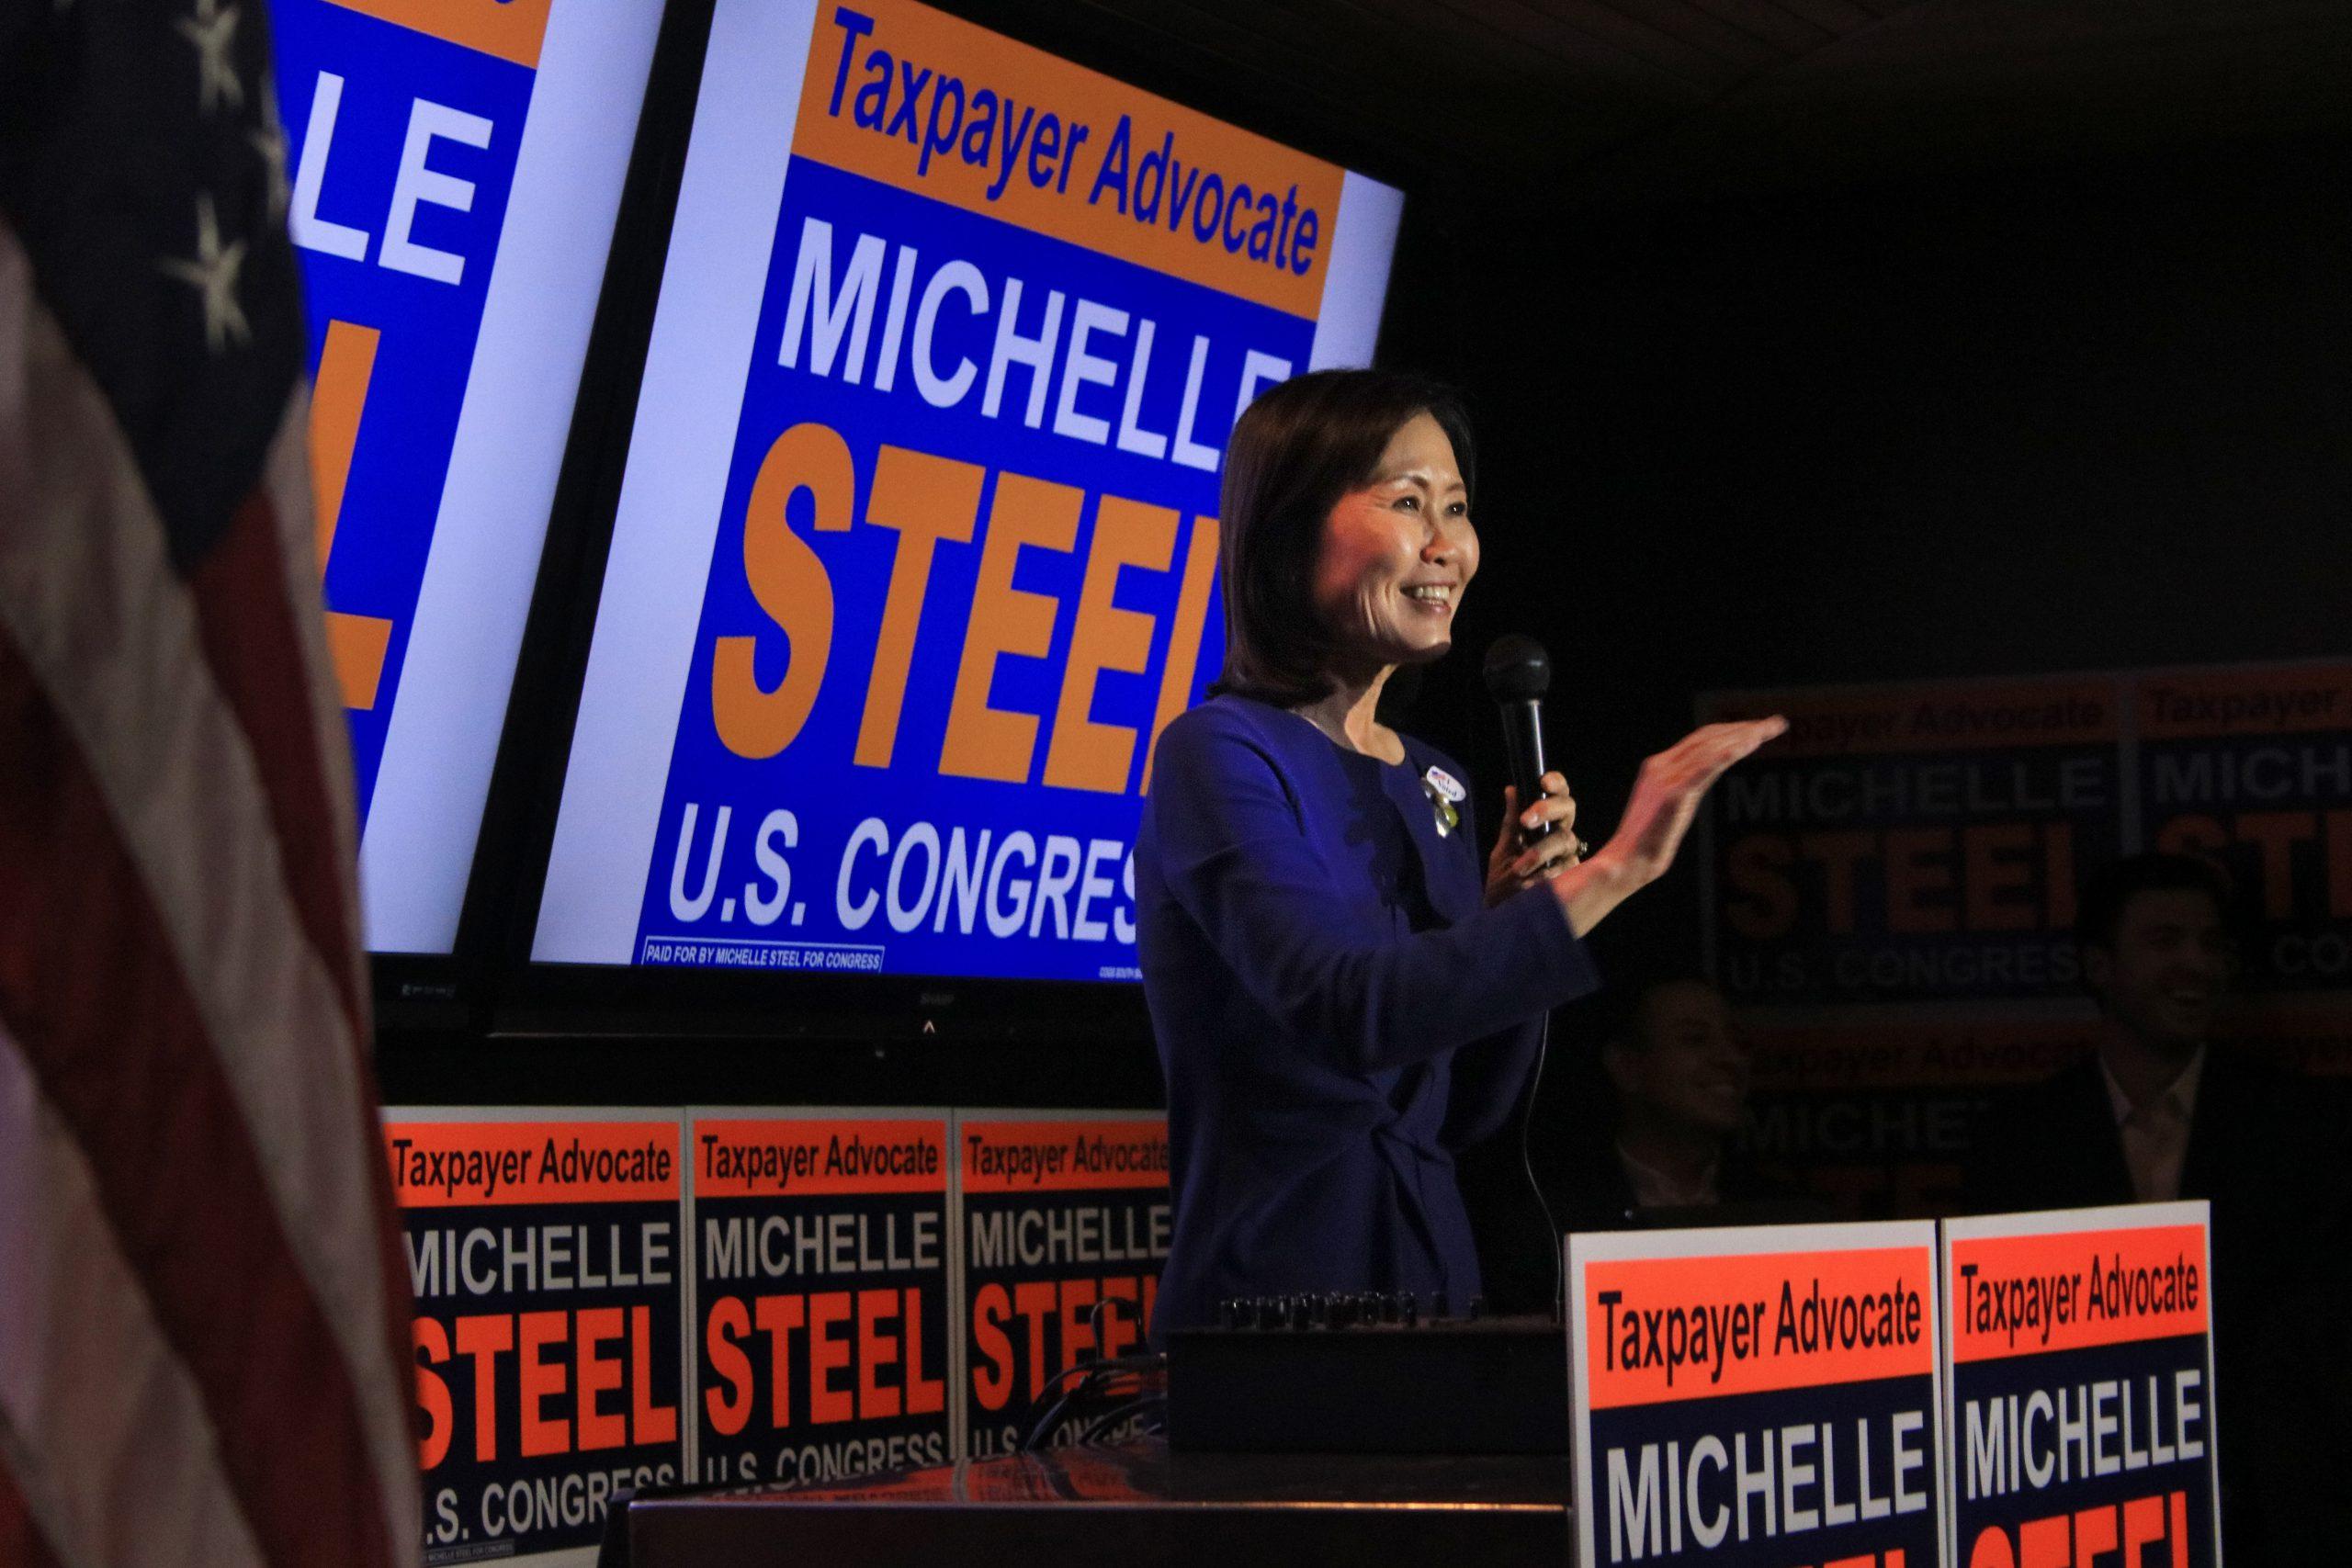 www.lagunabeachindy.com: Steel unseats Rouda to represent coastal O.C. in congress